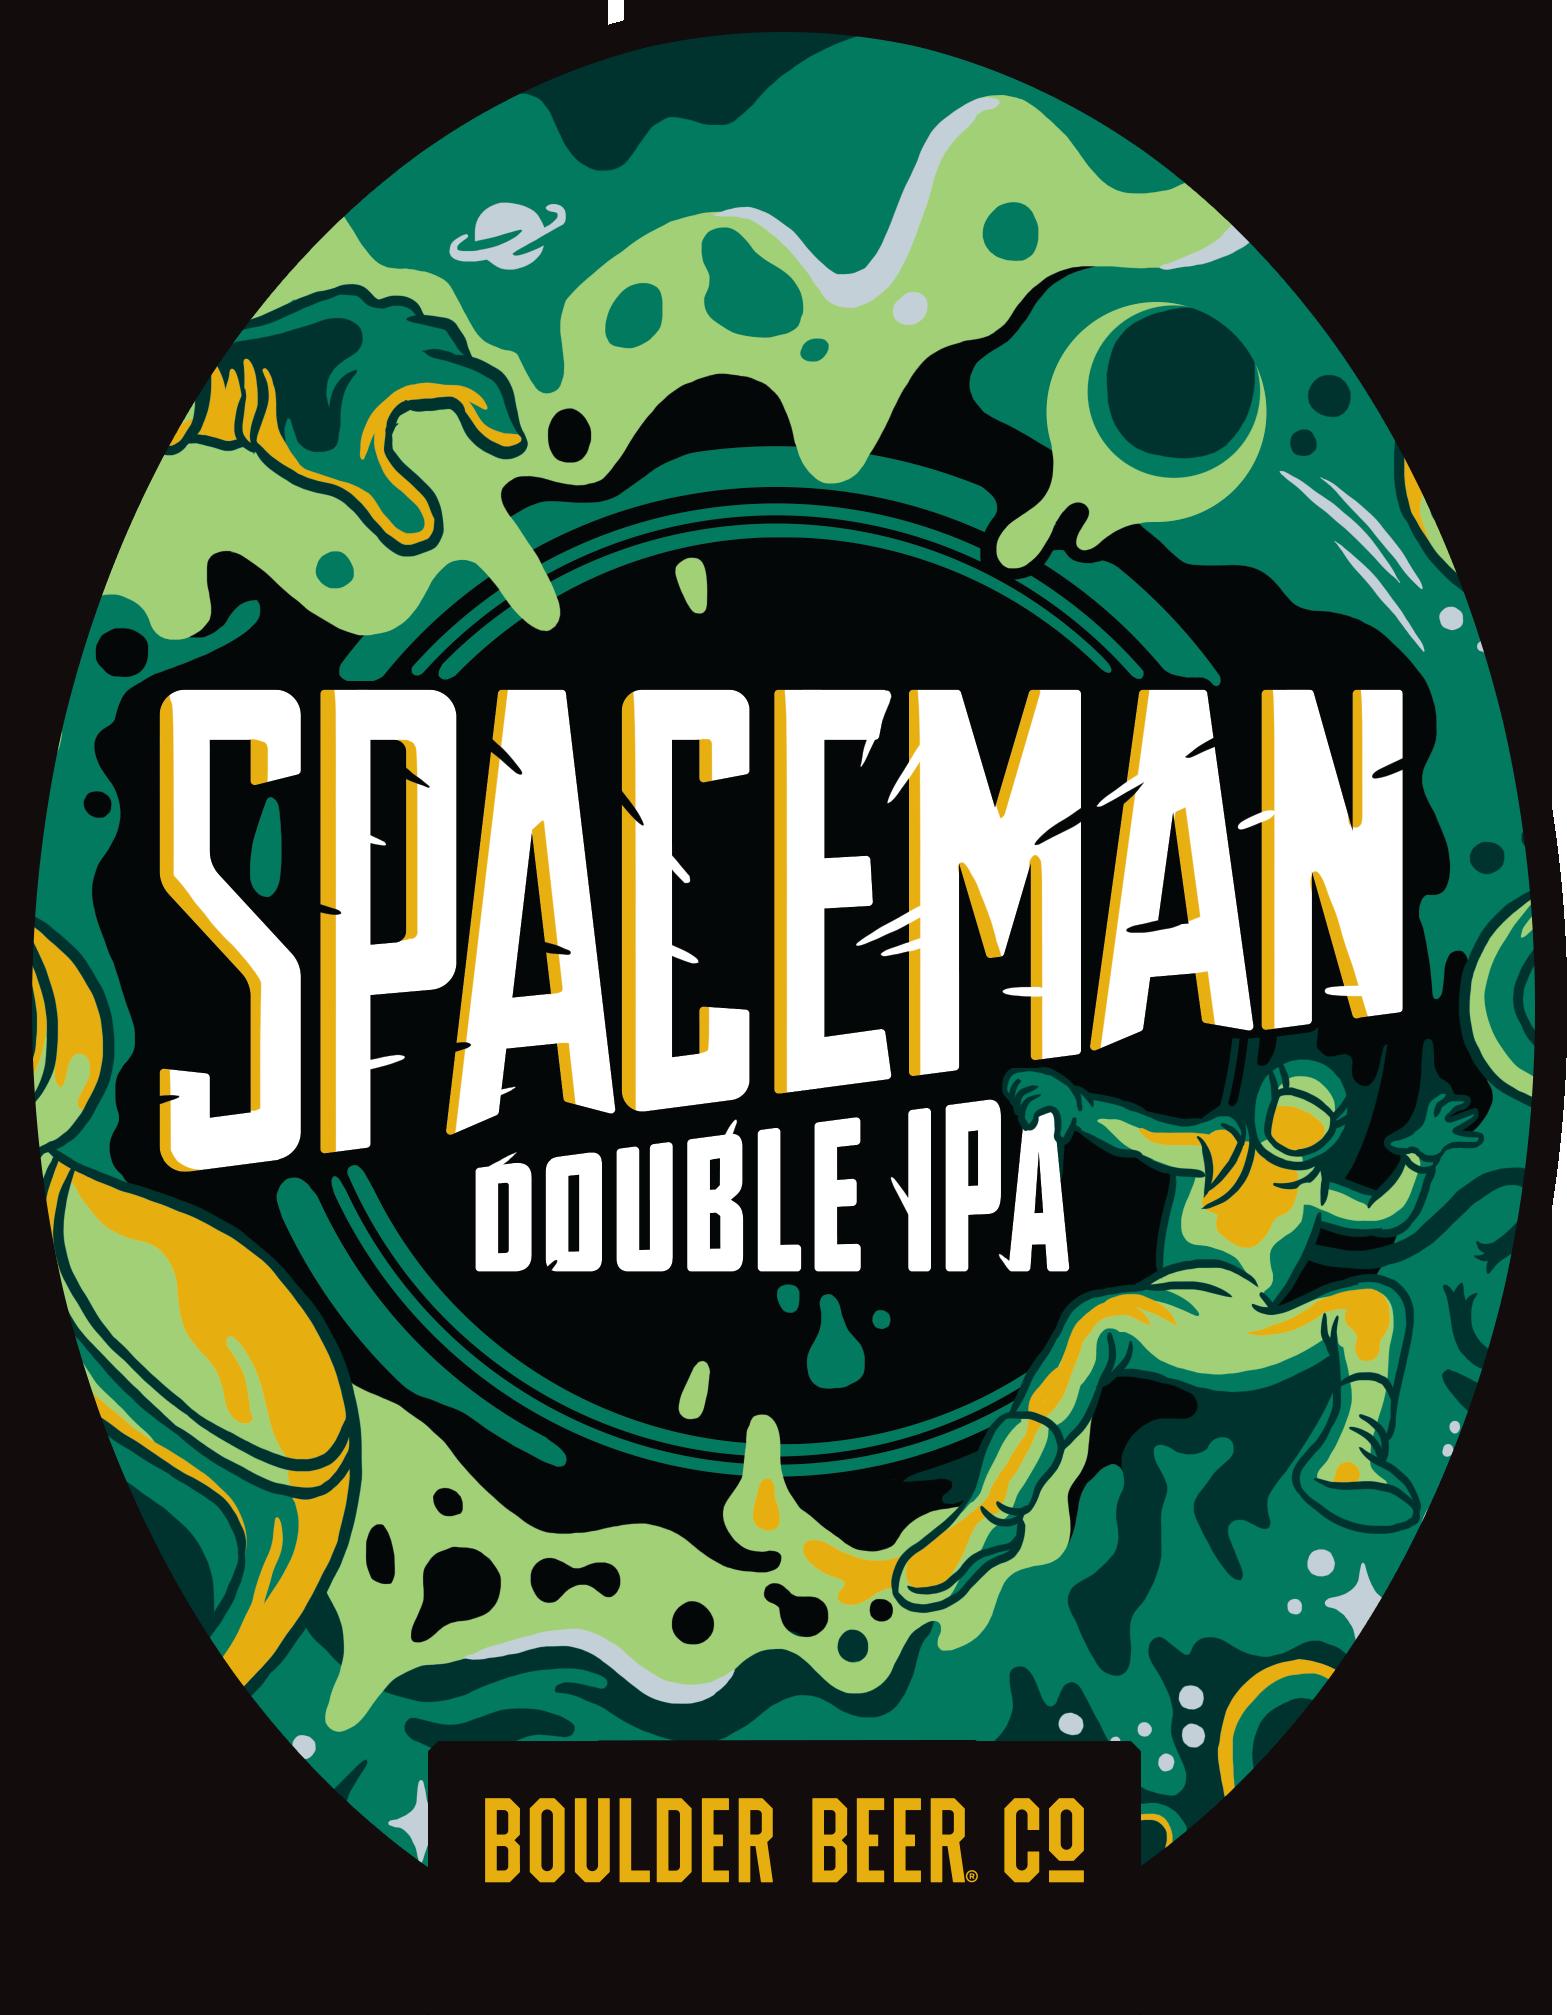 04723-1.3 Boulder Beer Spaceman Oval.png